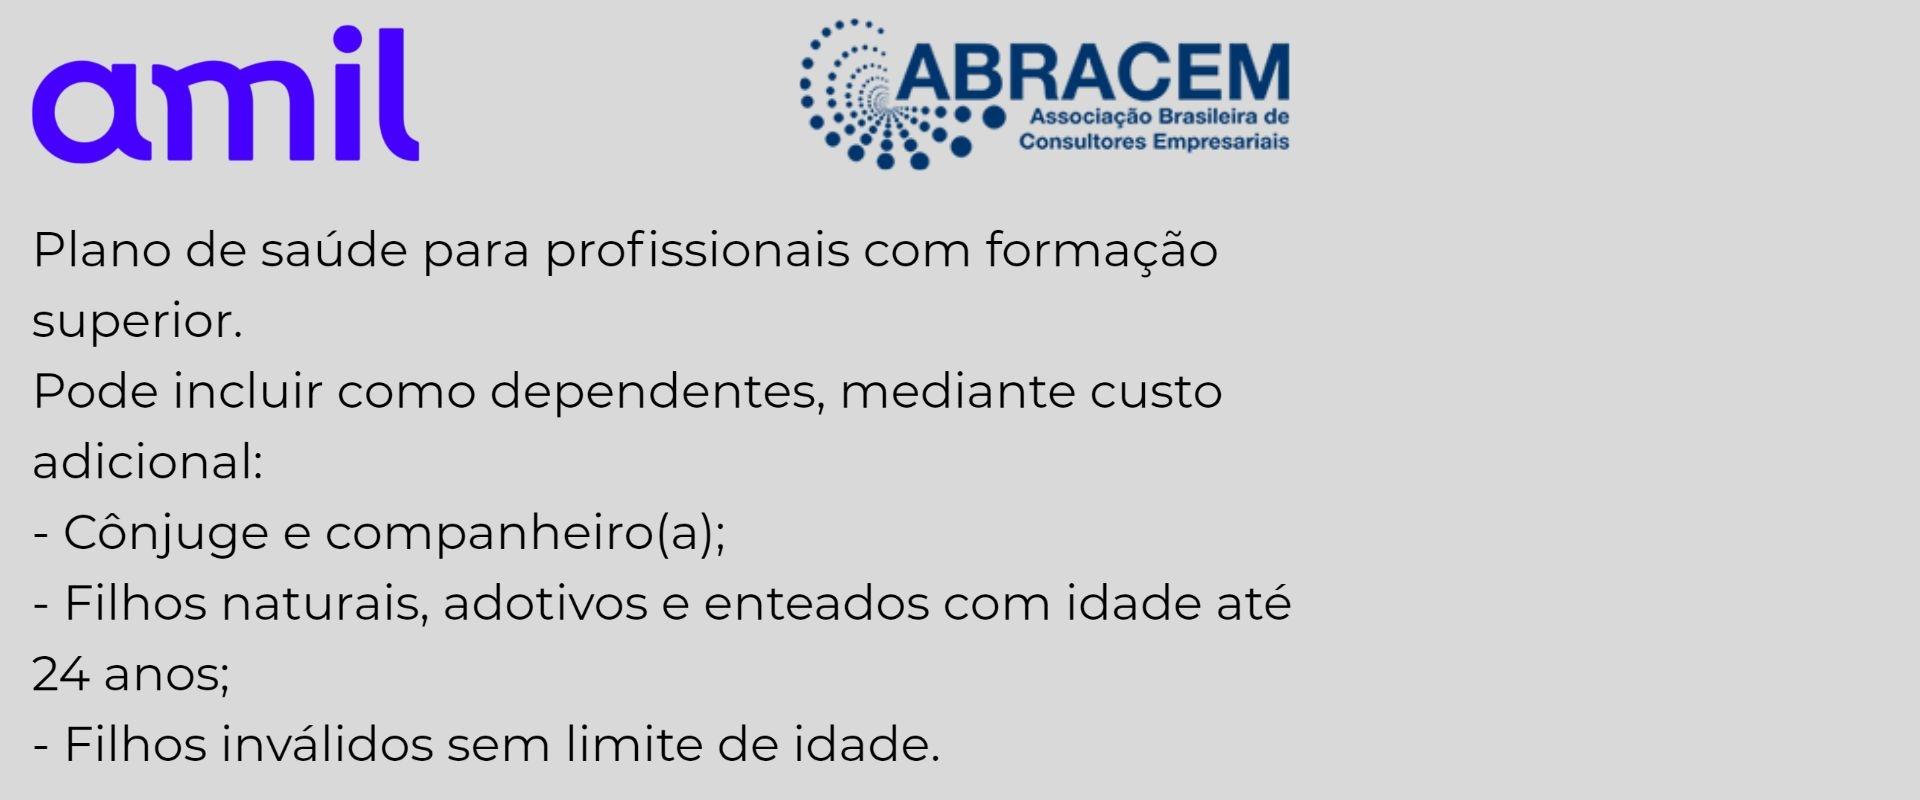 Amil Abracem-RJ